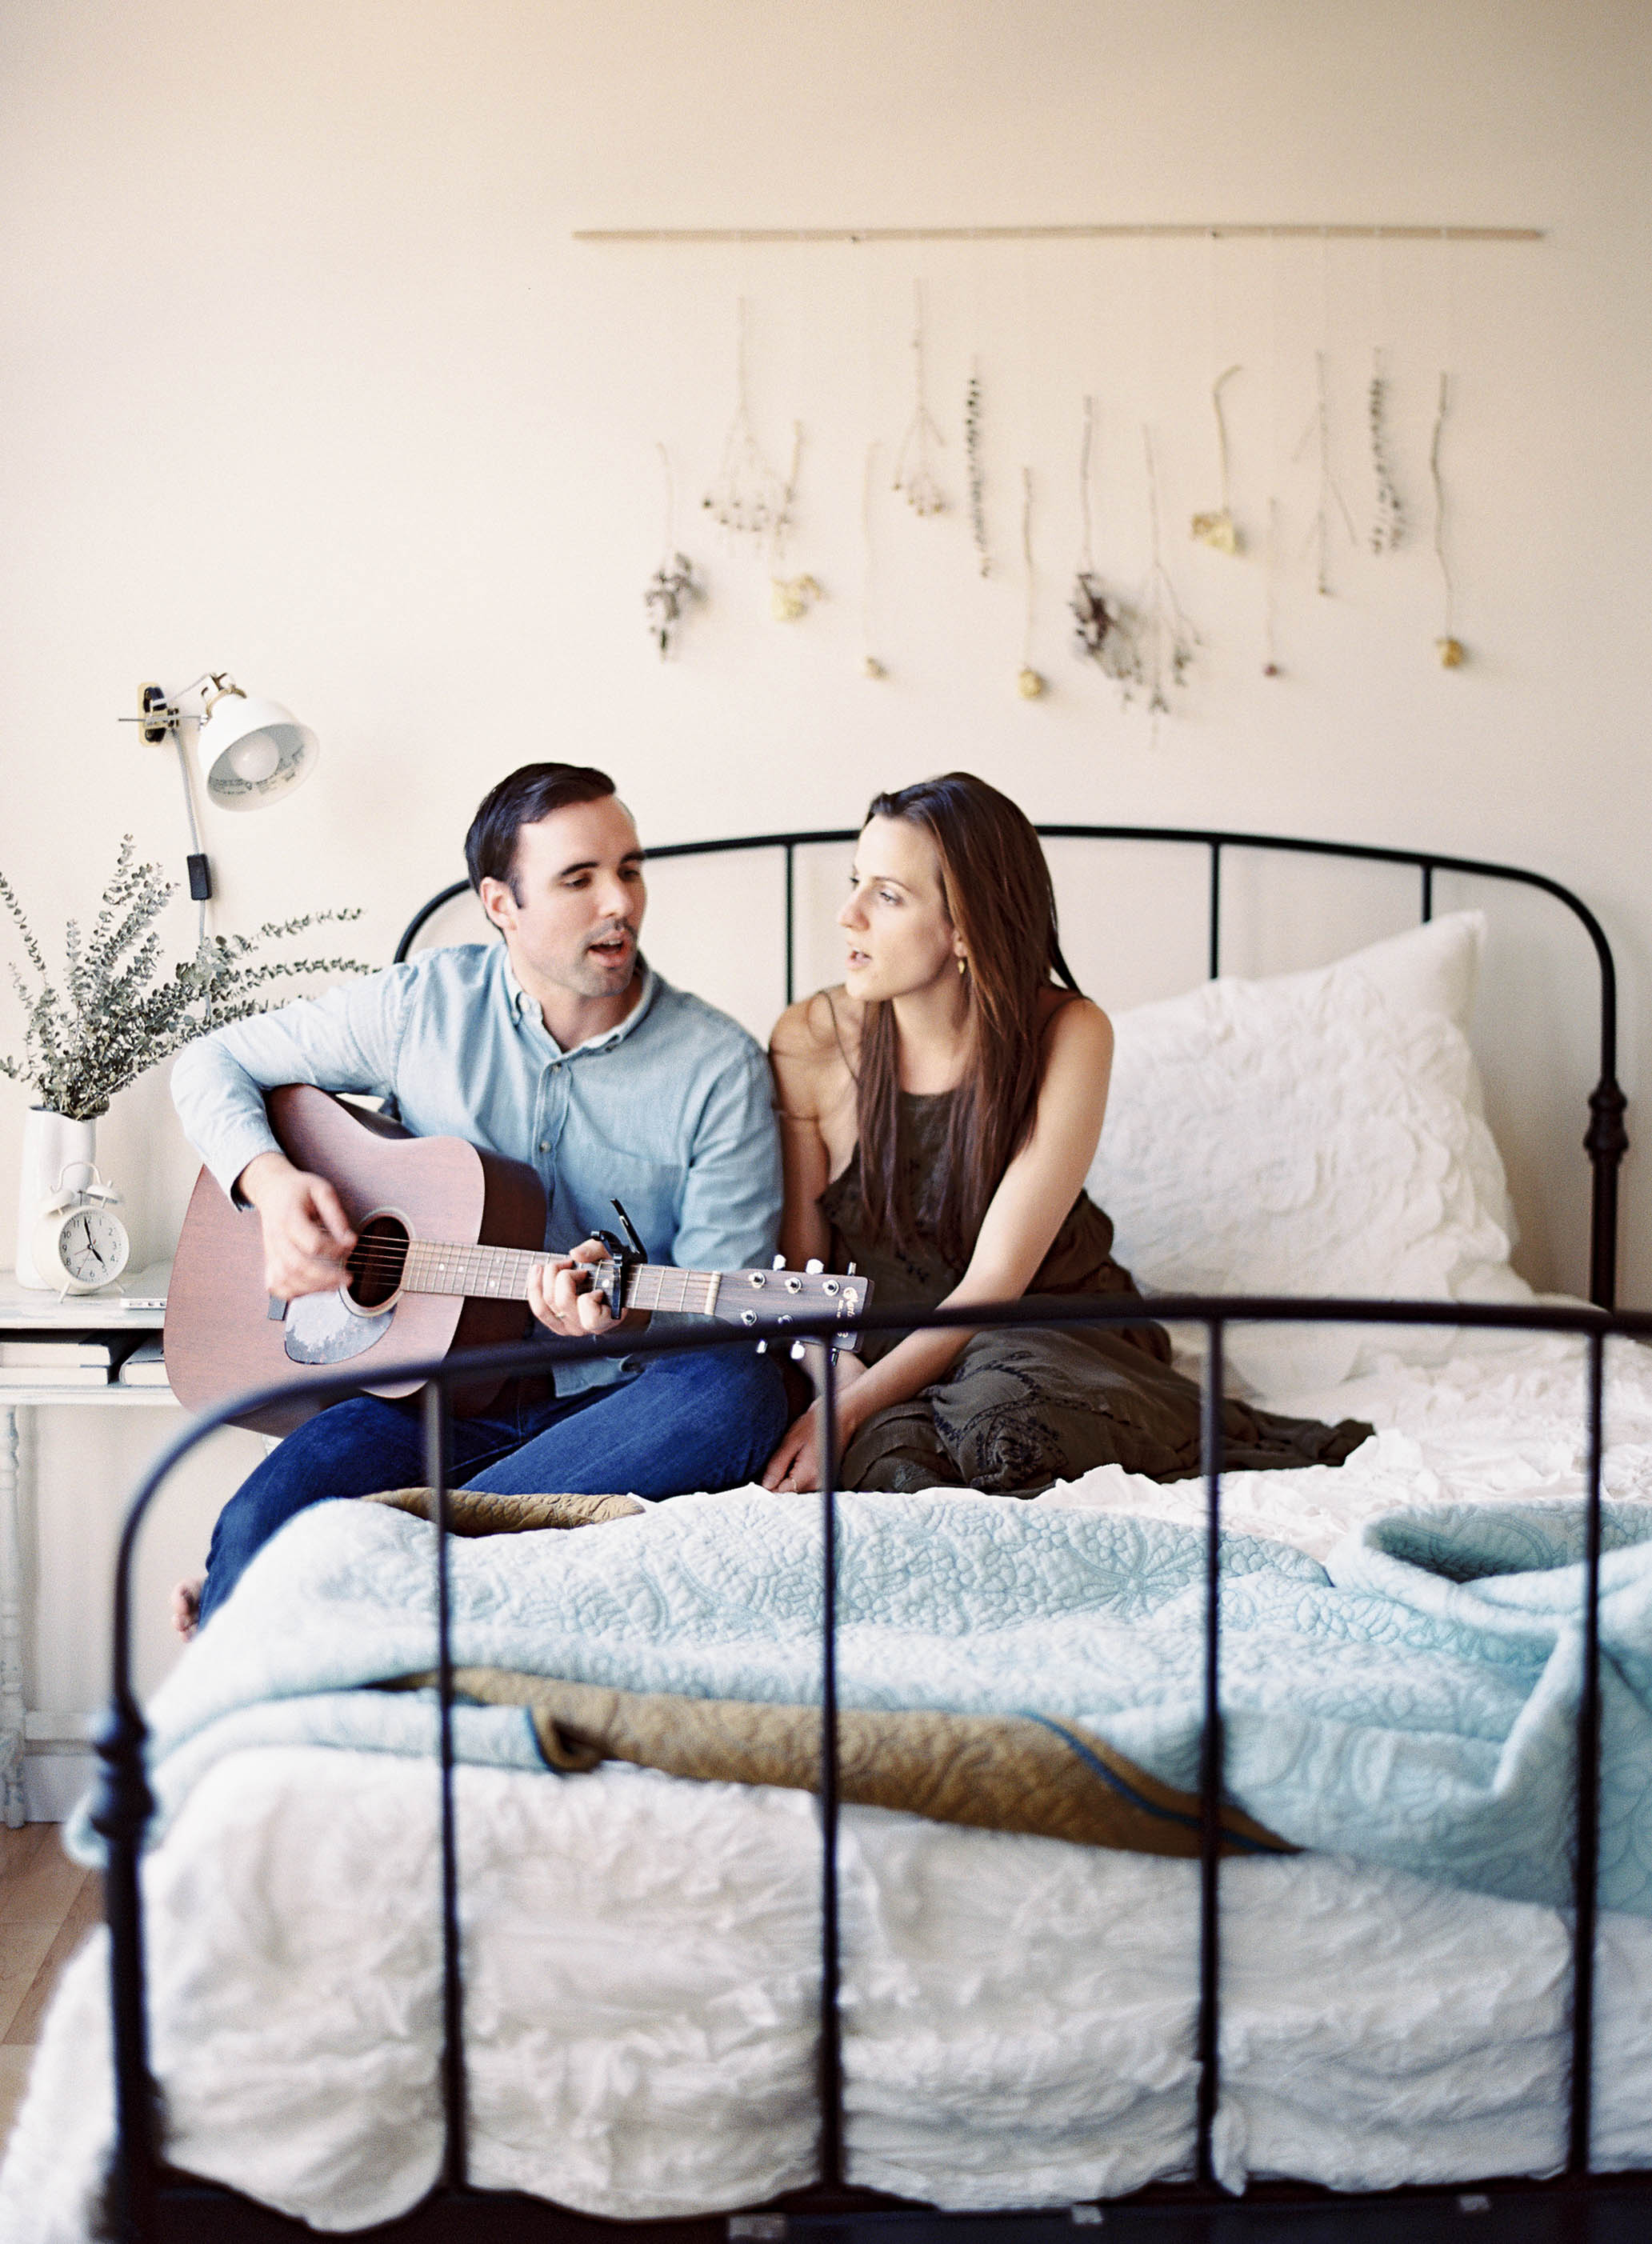 Meghan Mehan Photography | Fine Art Film Wedding Photographer | California | San Francisco | Napa | Sonoma | Santa Barbara | Big Sur | Los Angeles | Destination Wedding Photographer 037.jpg